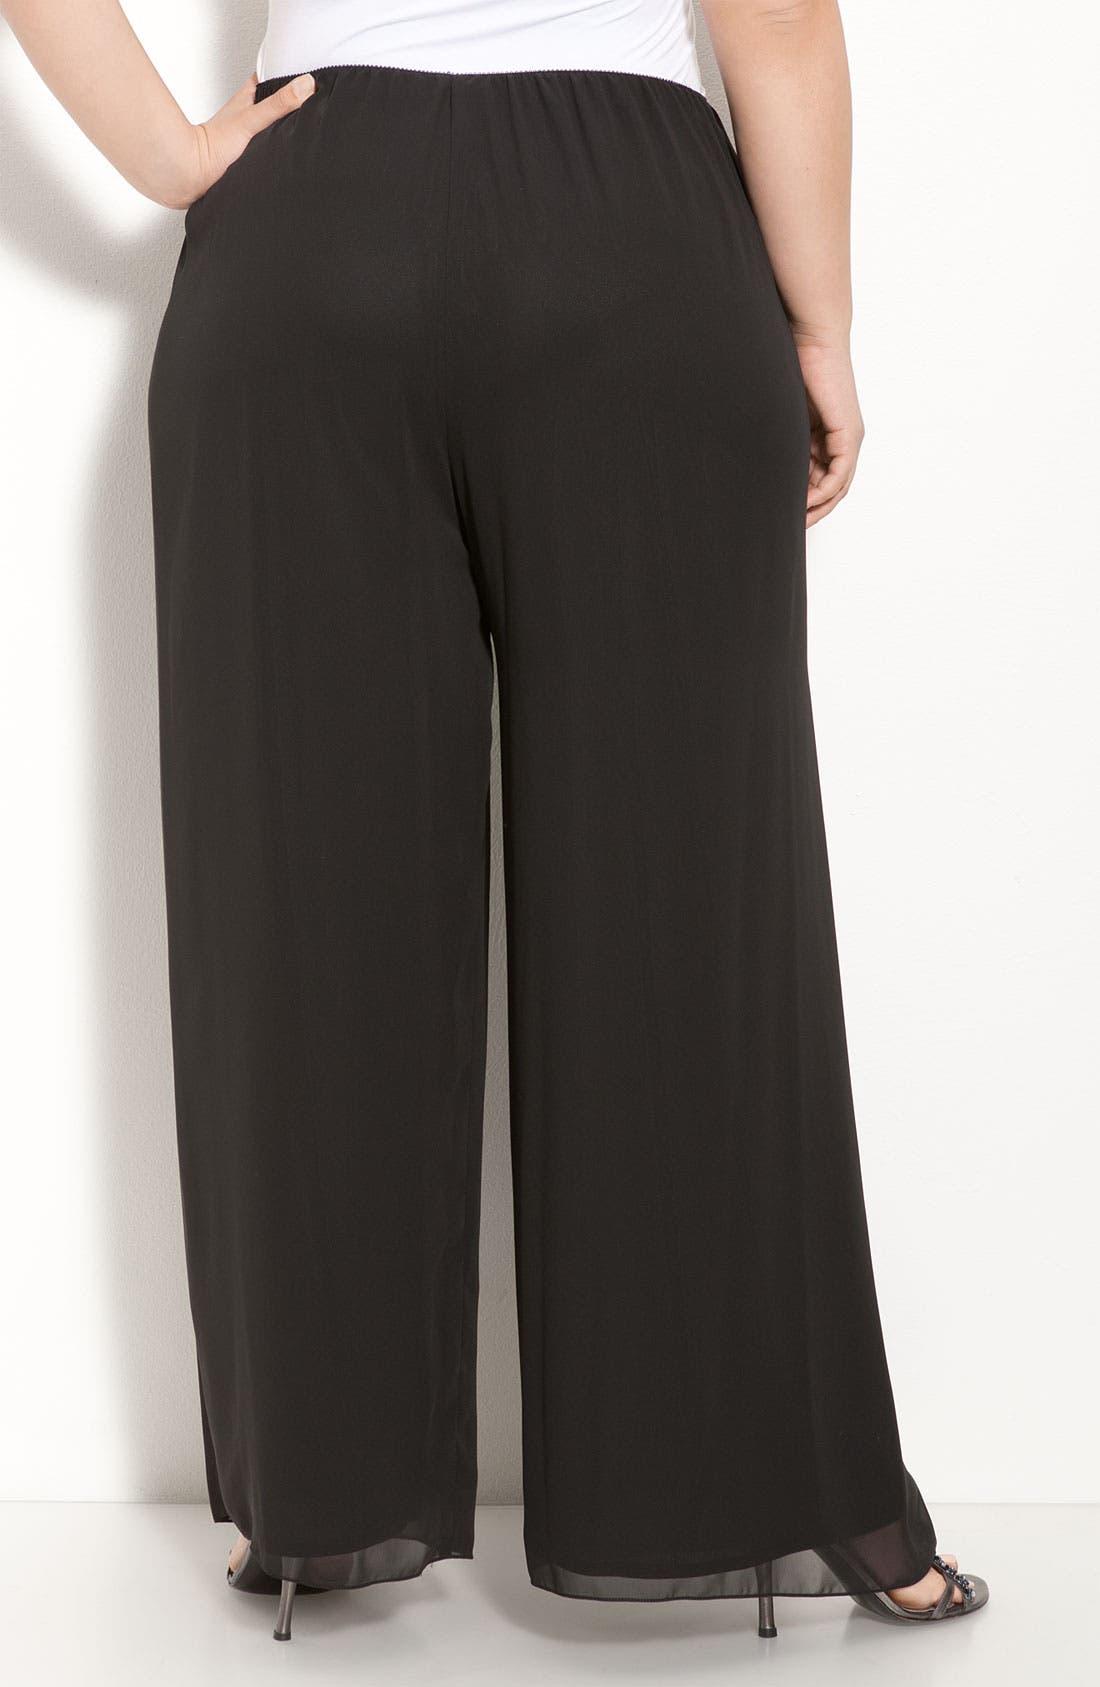 ad91c42886 Women's High-Waisted Pants & Leggings